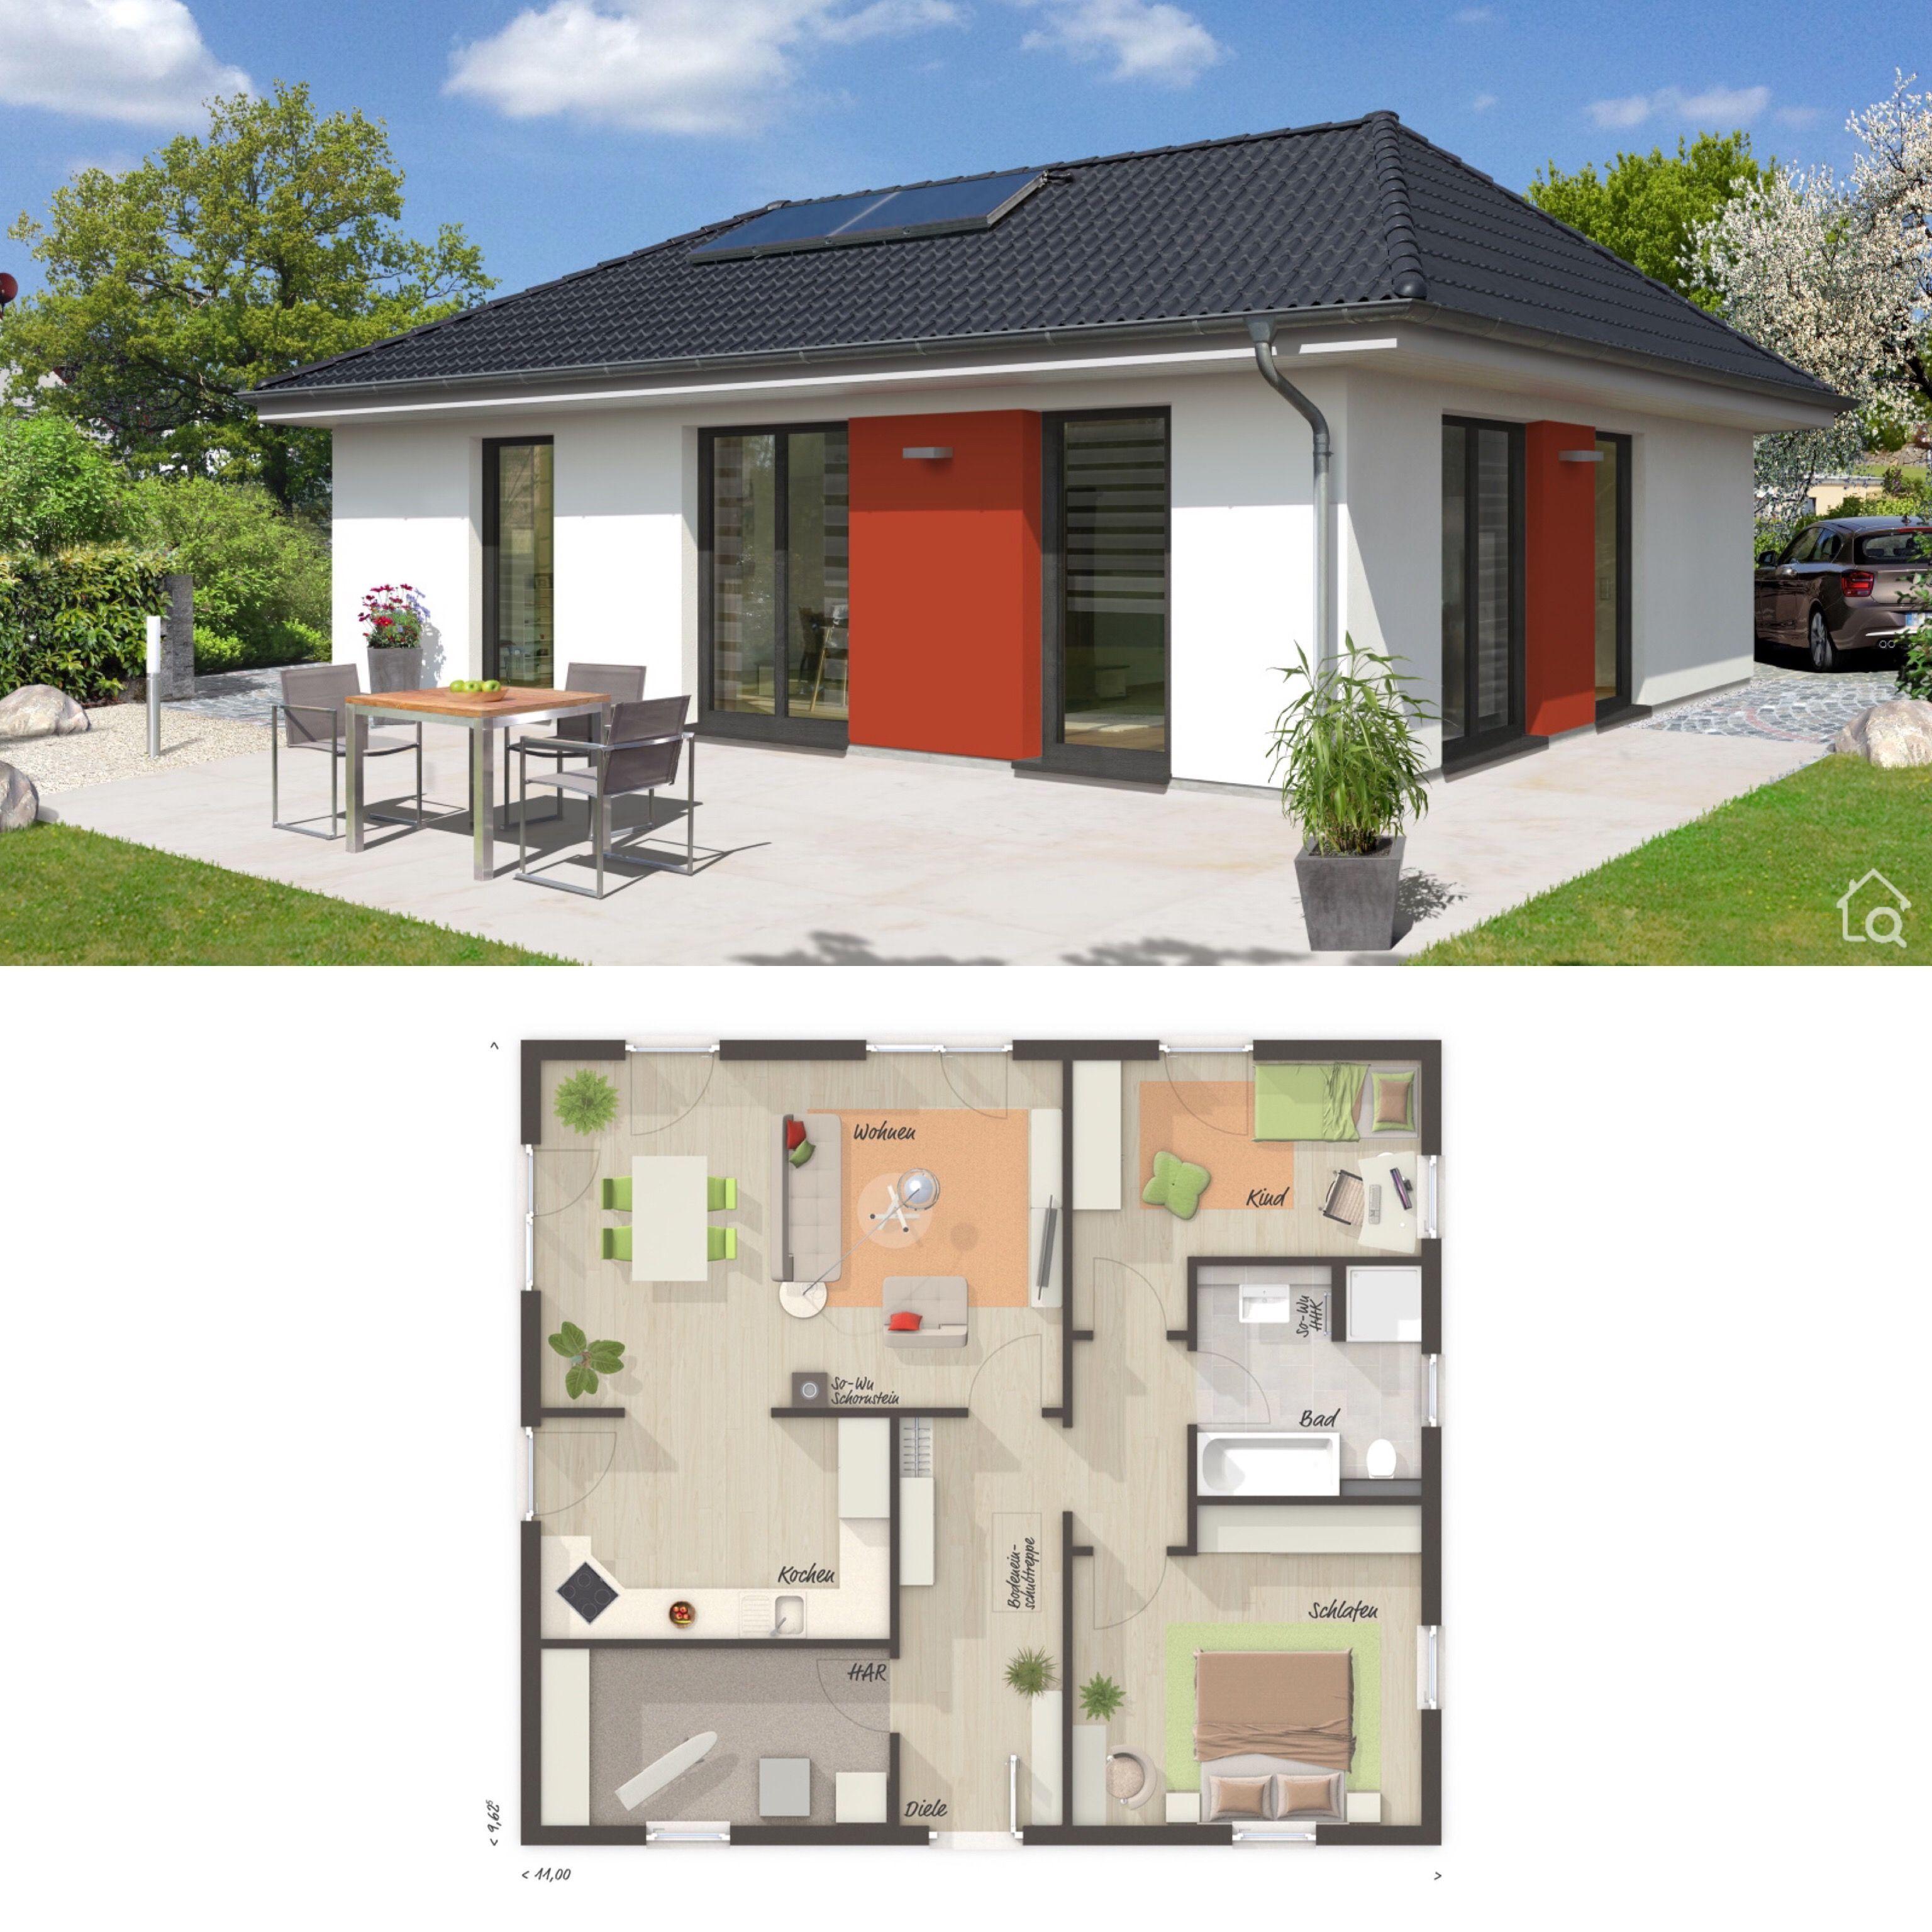 Moderner Bungalow Neubau mit Walmdach Architektur & 3